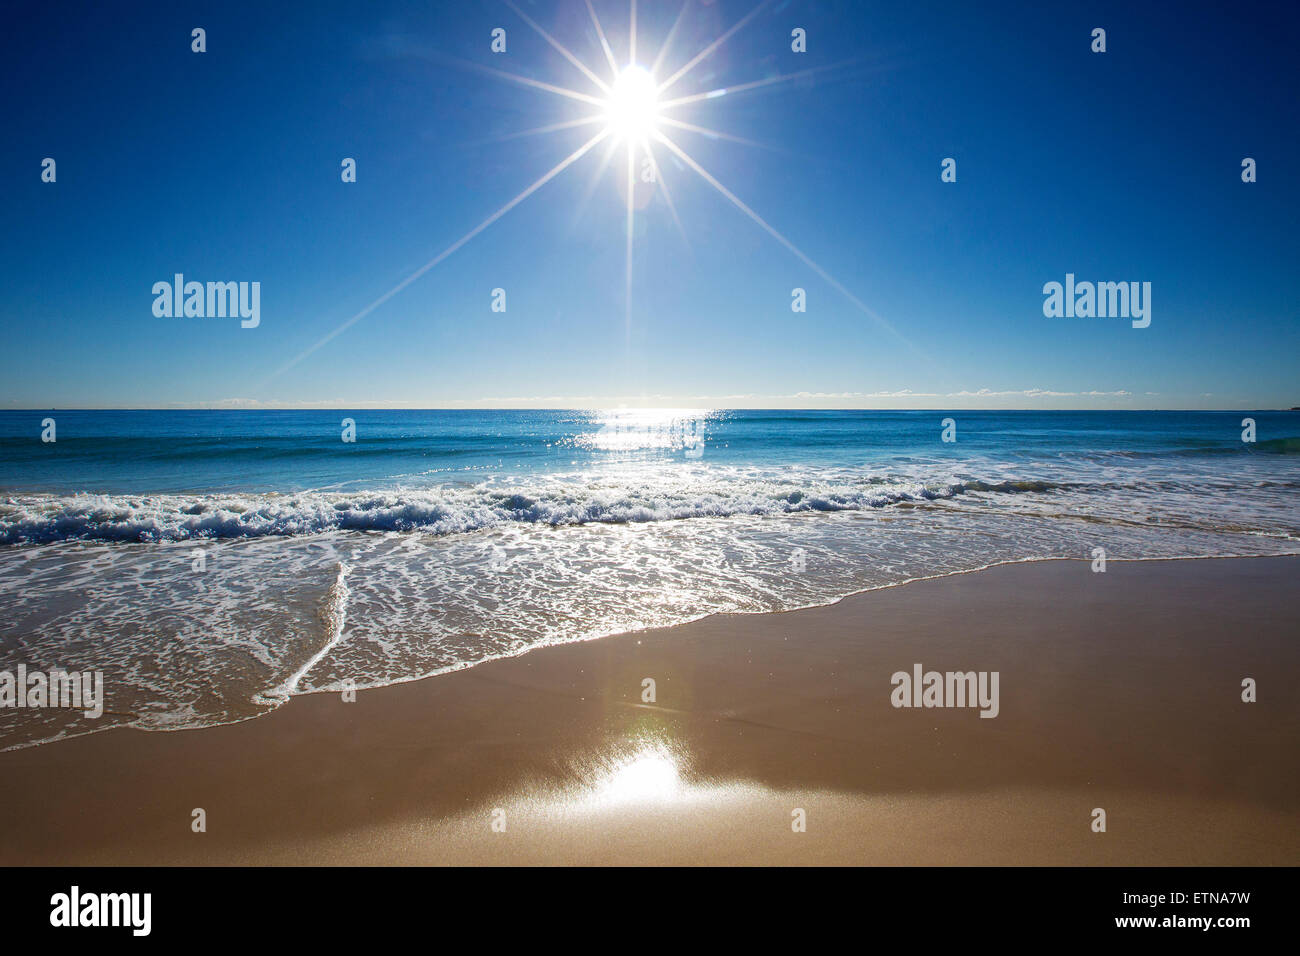 Sunbeam over the sea on Gold Coast, Queensland, Australia - Stock Image